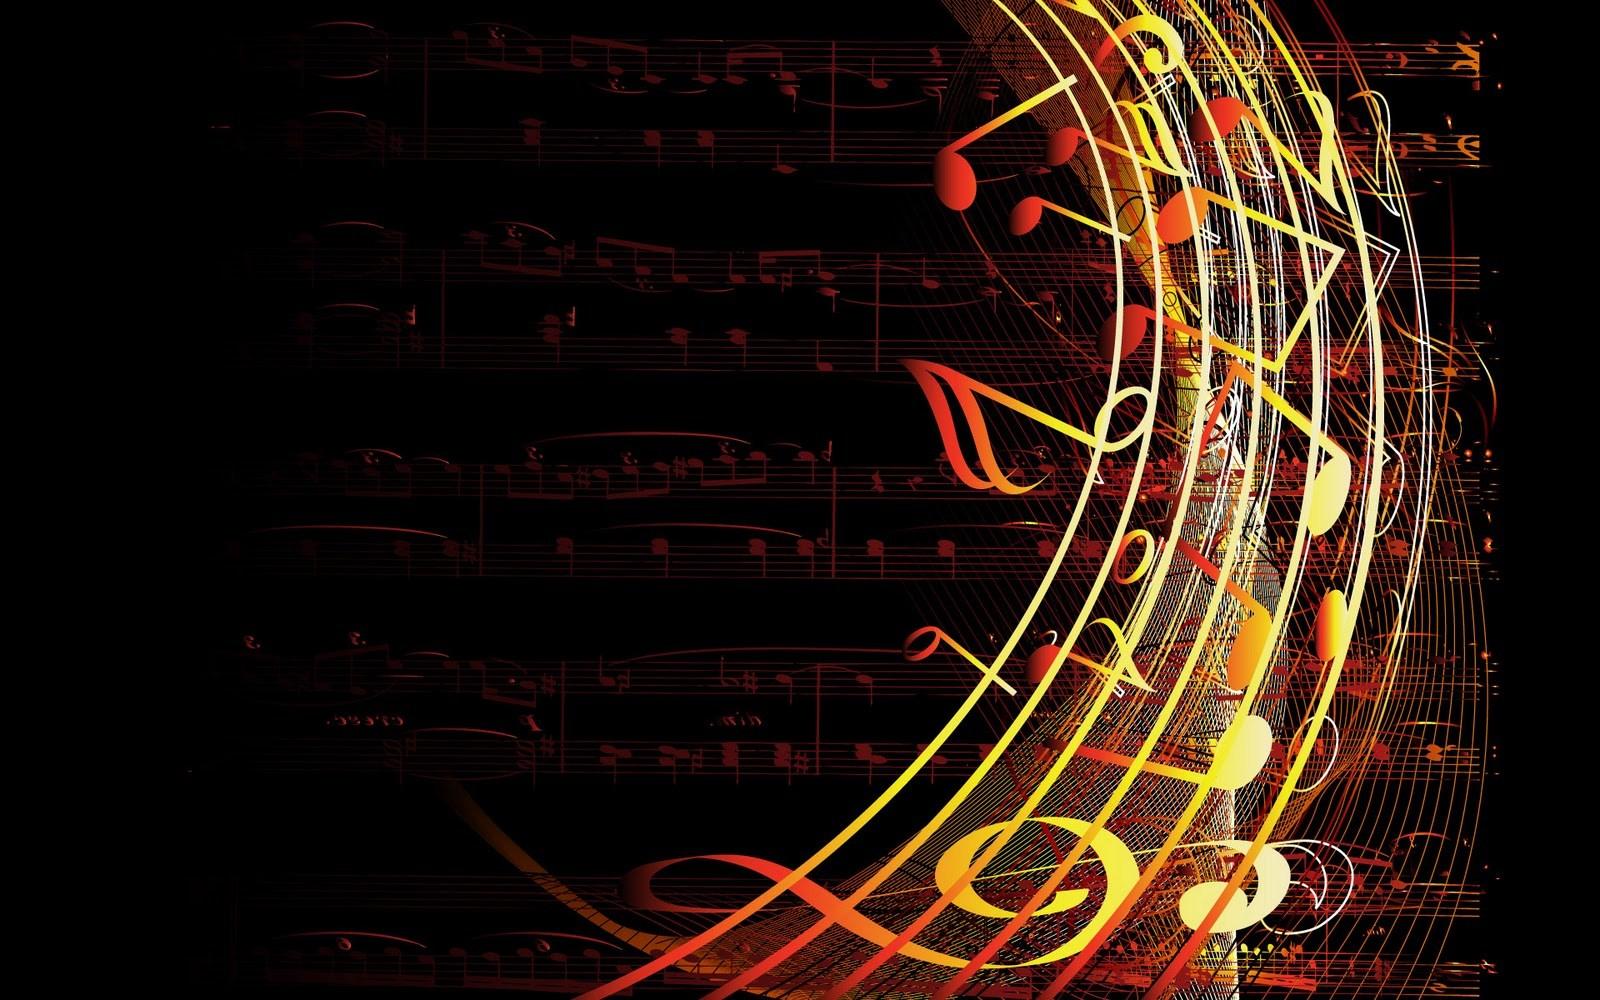 Top Wallpaper Mac Music - Awesome-Wallpaper-Music-HD-Wallpapers-of-Nature-Full-HD-1080p-Desktop-Backgrounds-for-PC-Mac-Laptop-Tablet-big-lounge-sofa  HD_624334.jpg?ssl\u003d1